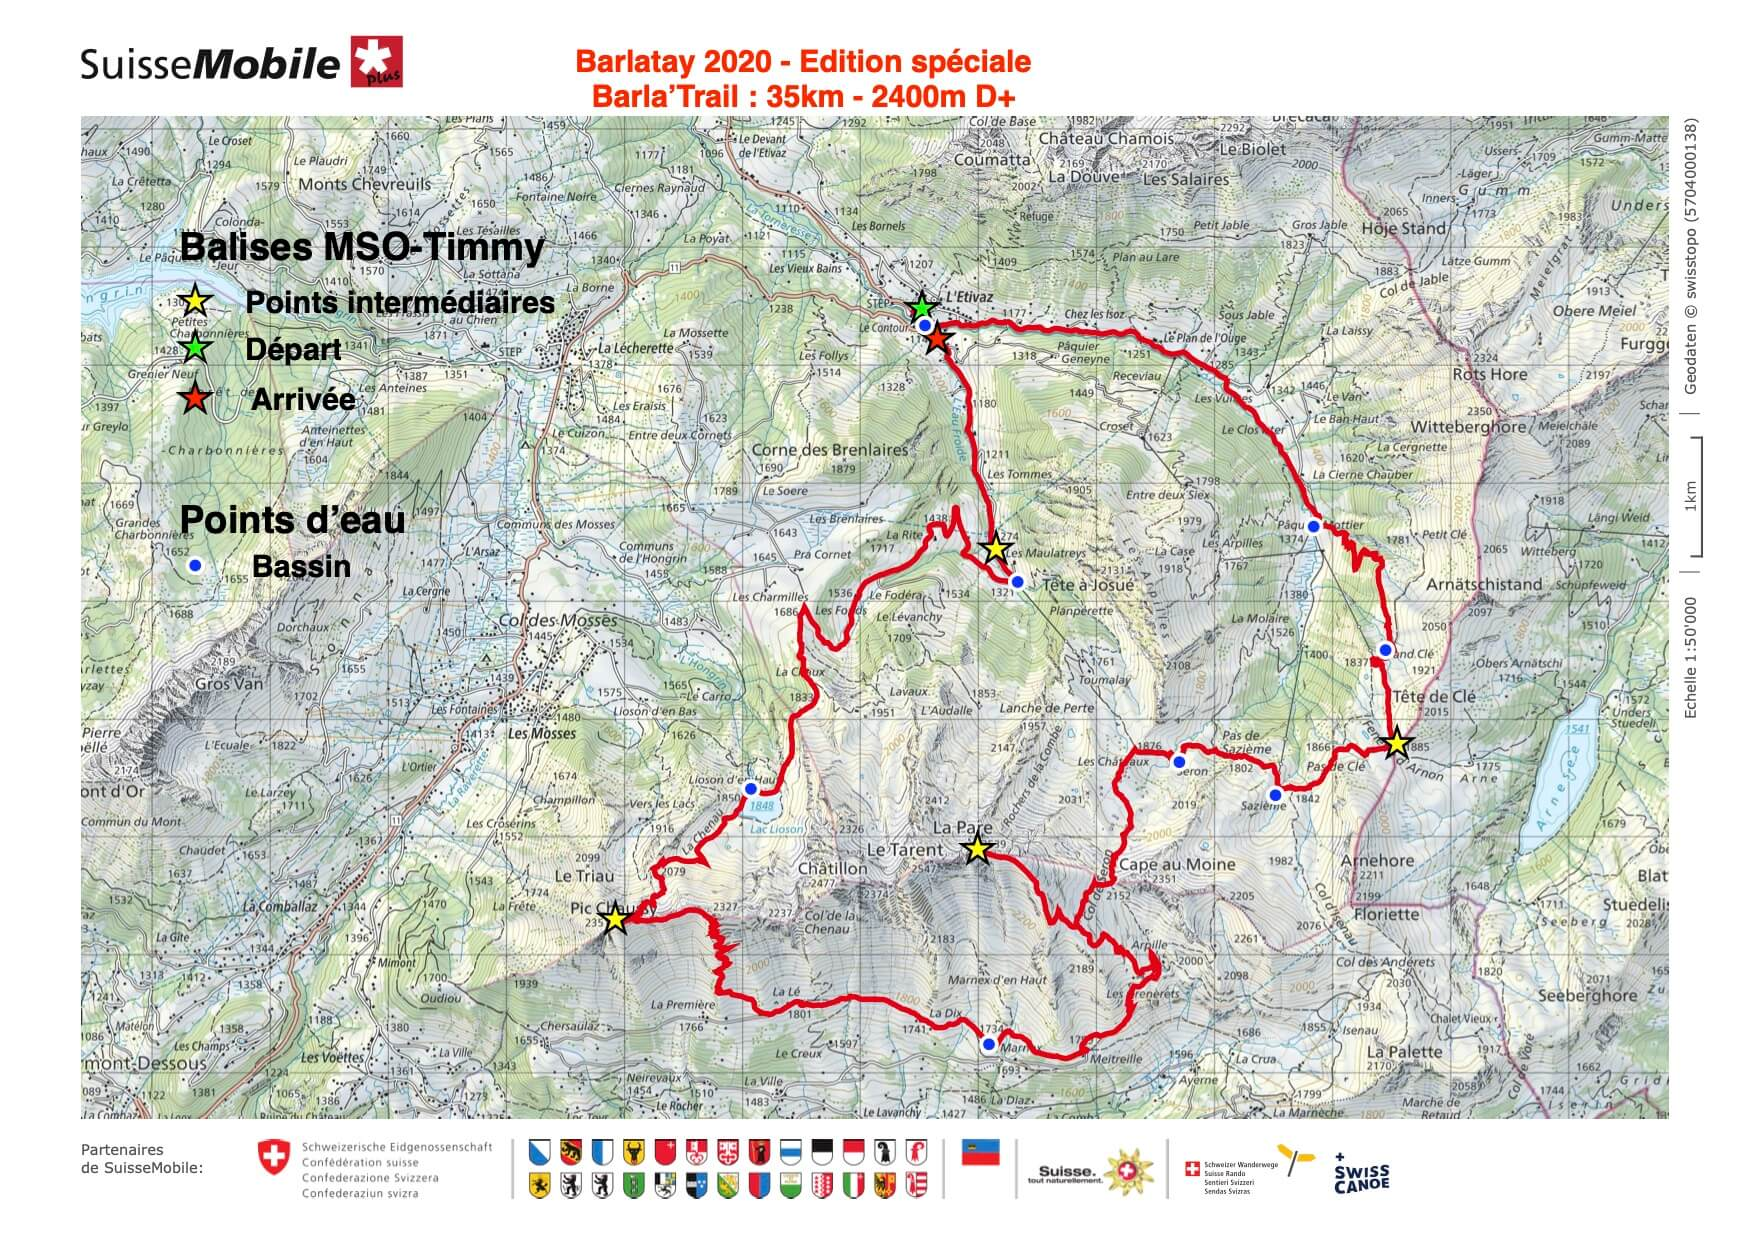 barlatay2020_parcours_trail35_print